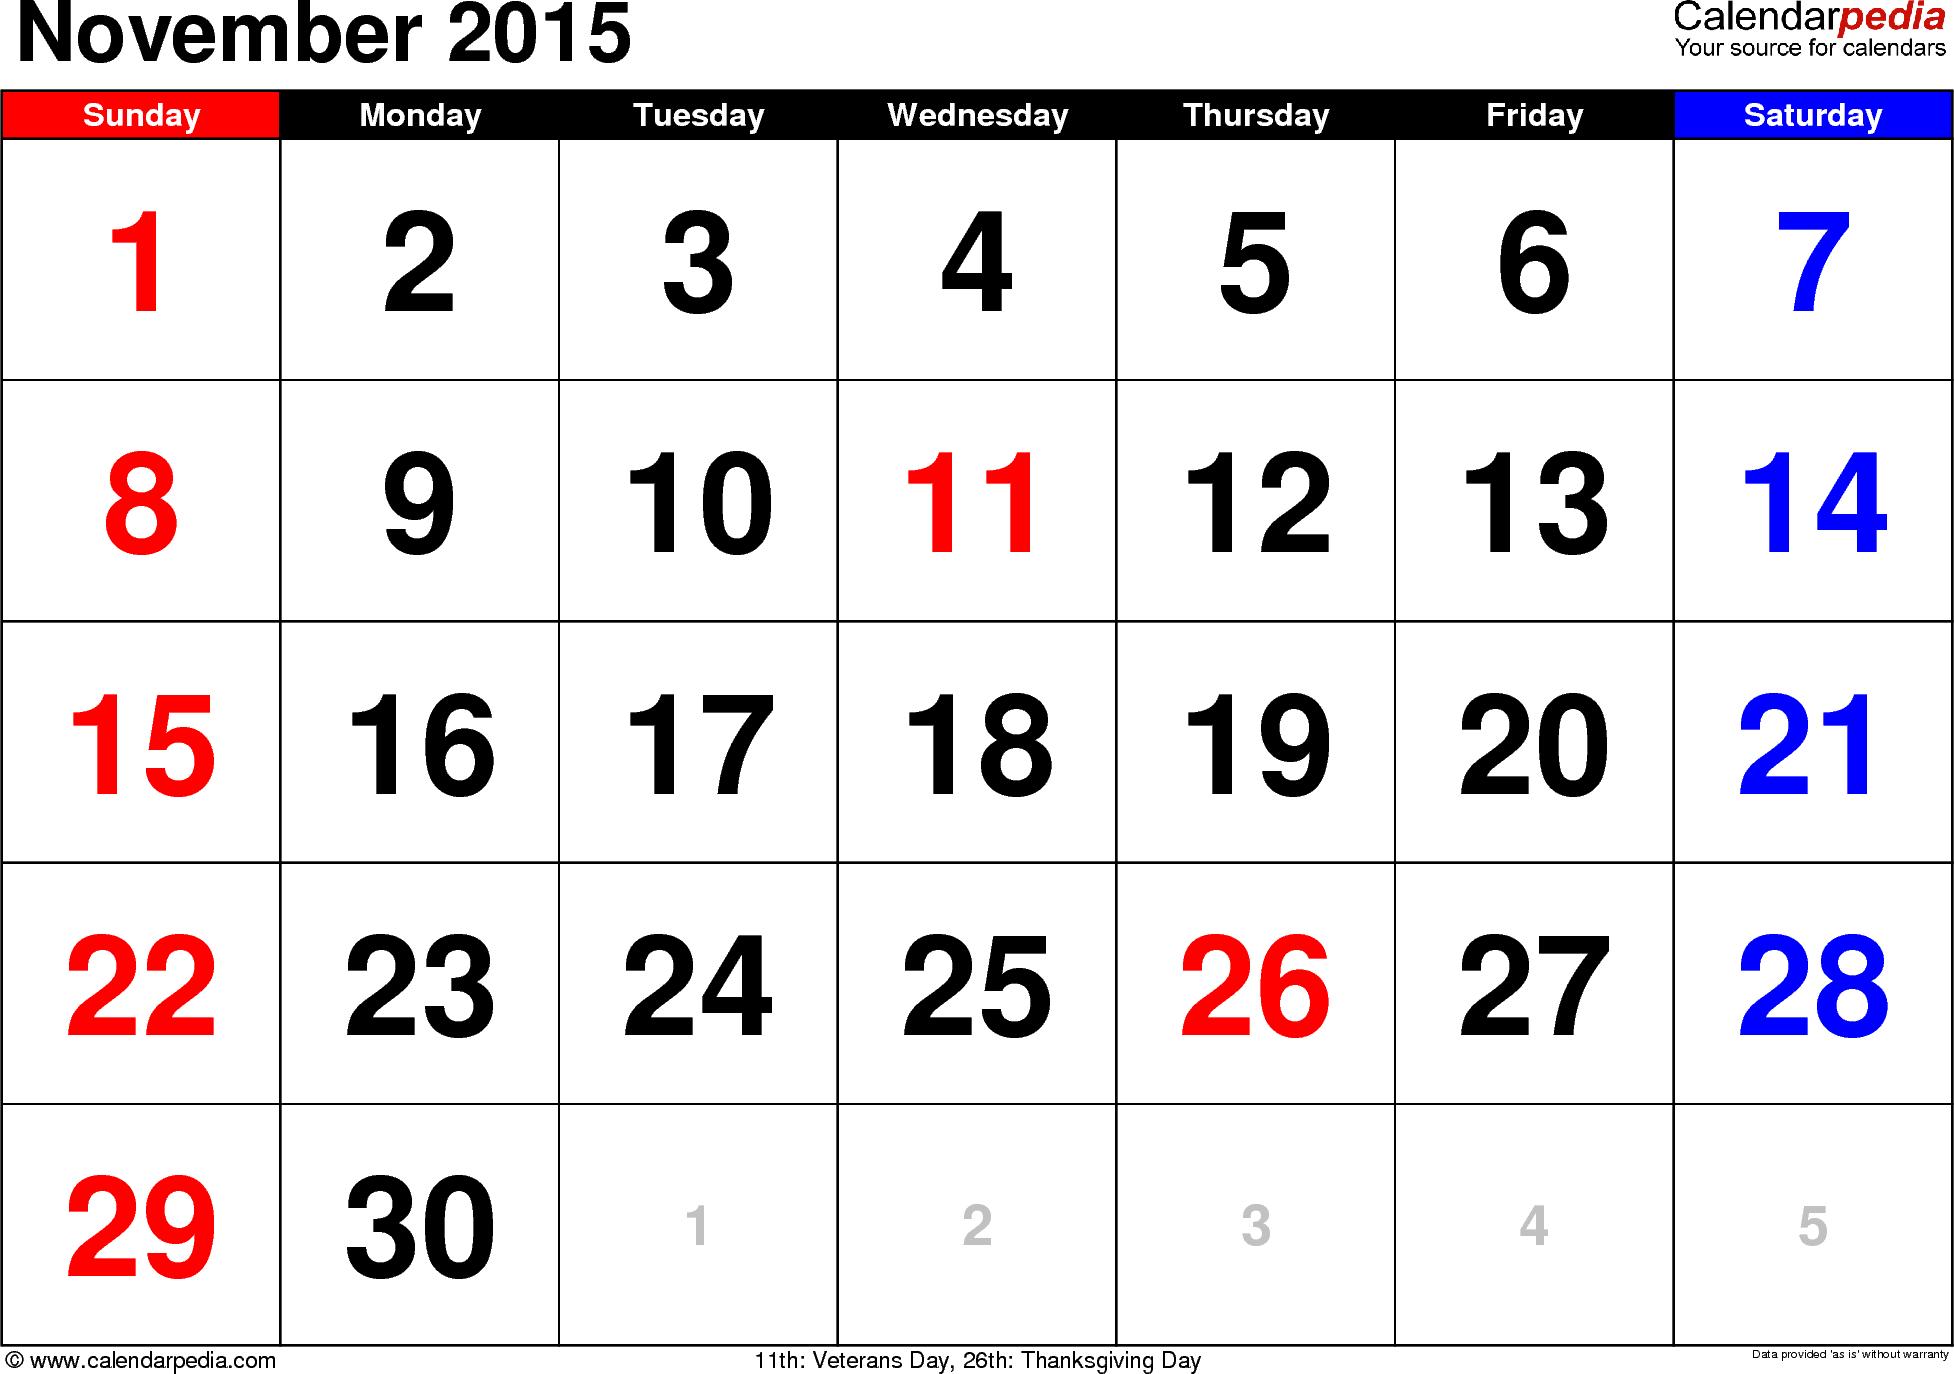 November 2015 Calendar With Holidays November 2015 Calendar Calendar Printables Free Printable Calendar Calendar Template